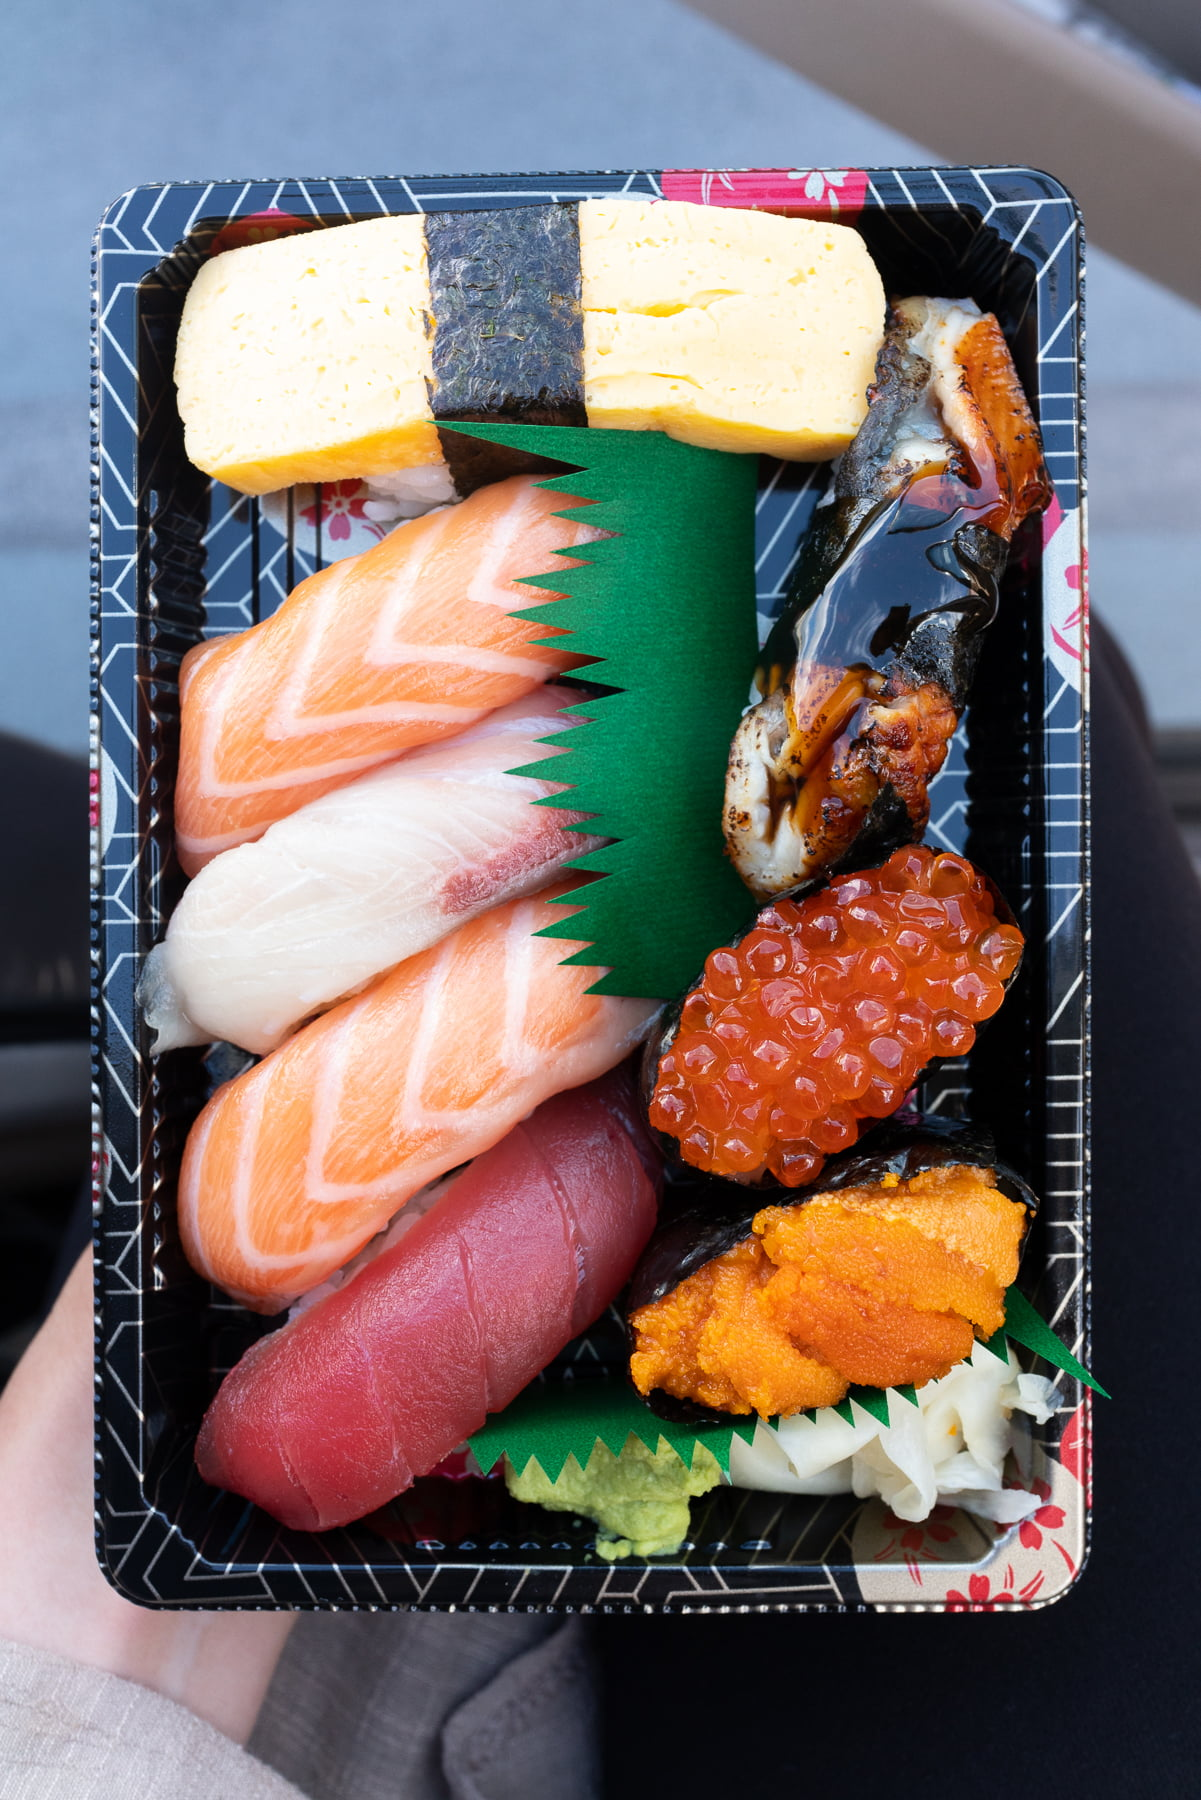 Sushi set from Fish & Rice.